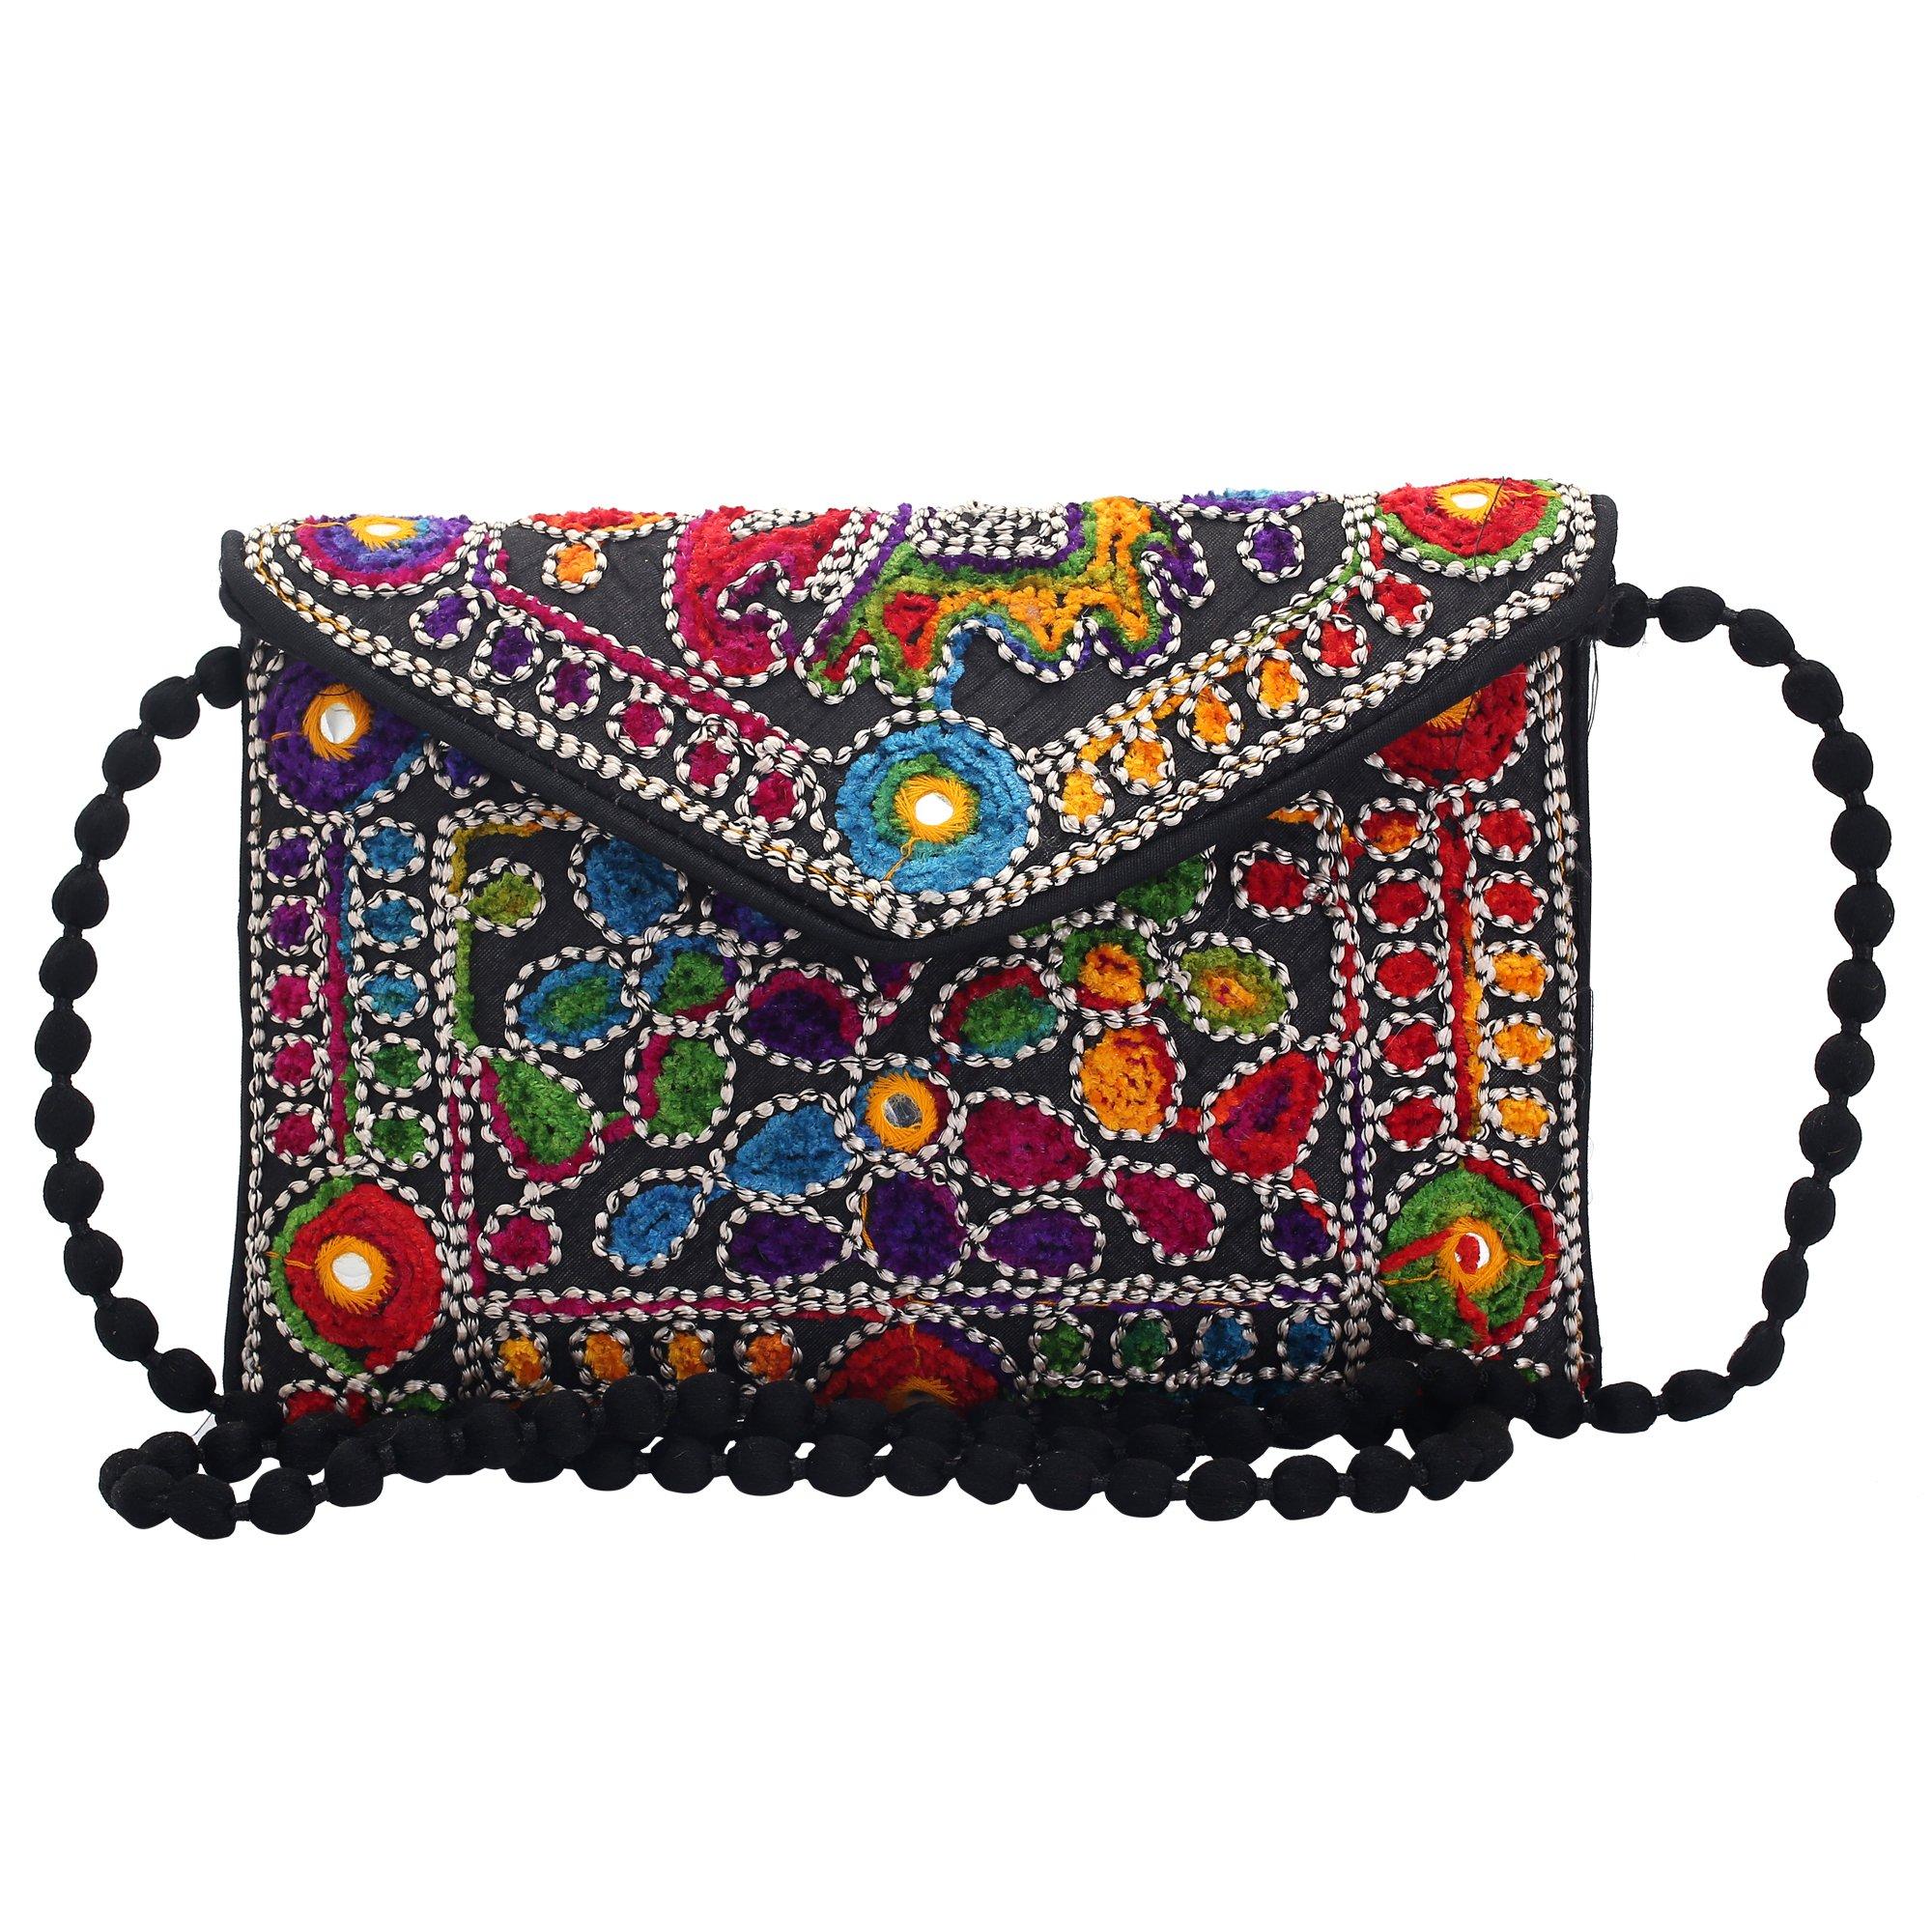 Jwellmart Indian Handicraft Ethnic Traditional Embroidered Evening Clutch Foldover Purse Handbag (Black)